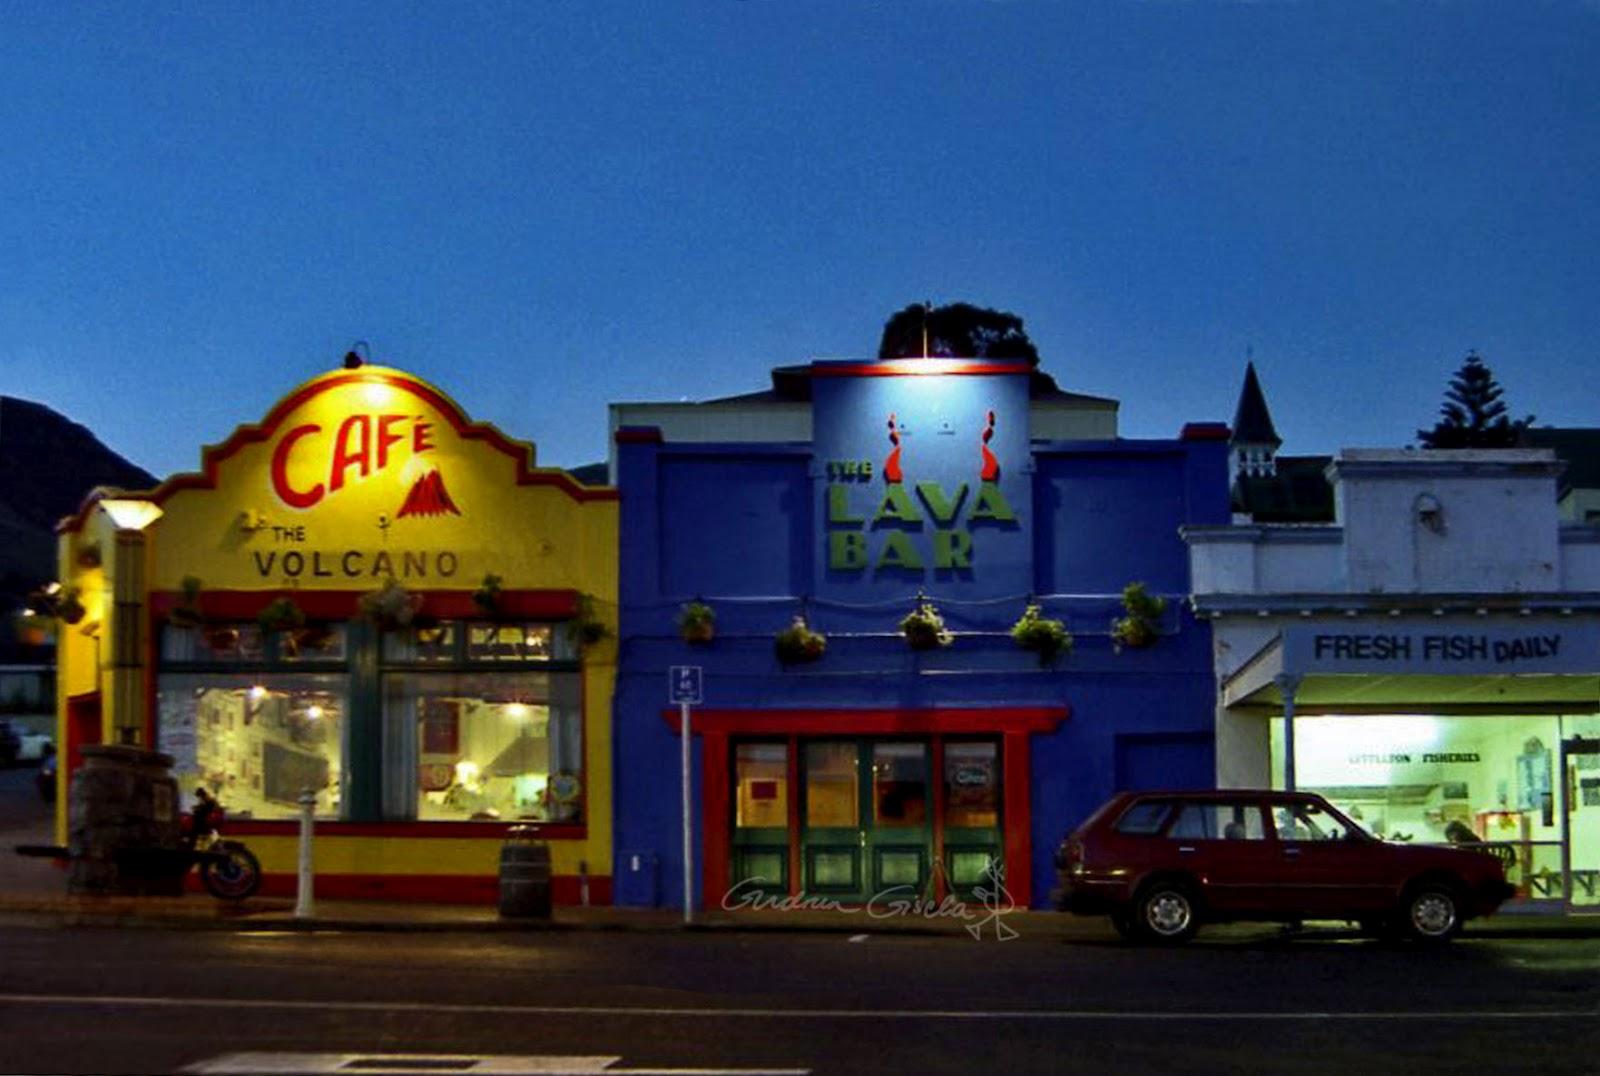 Arthur Street Cafe Baulkham Hills